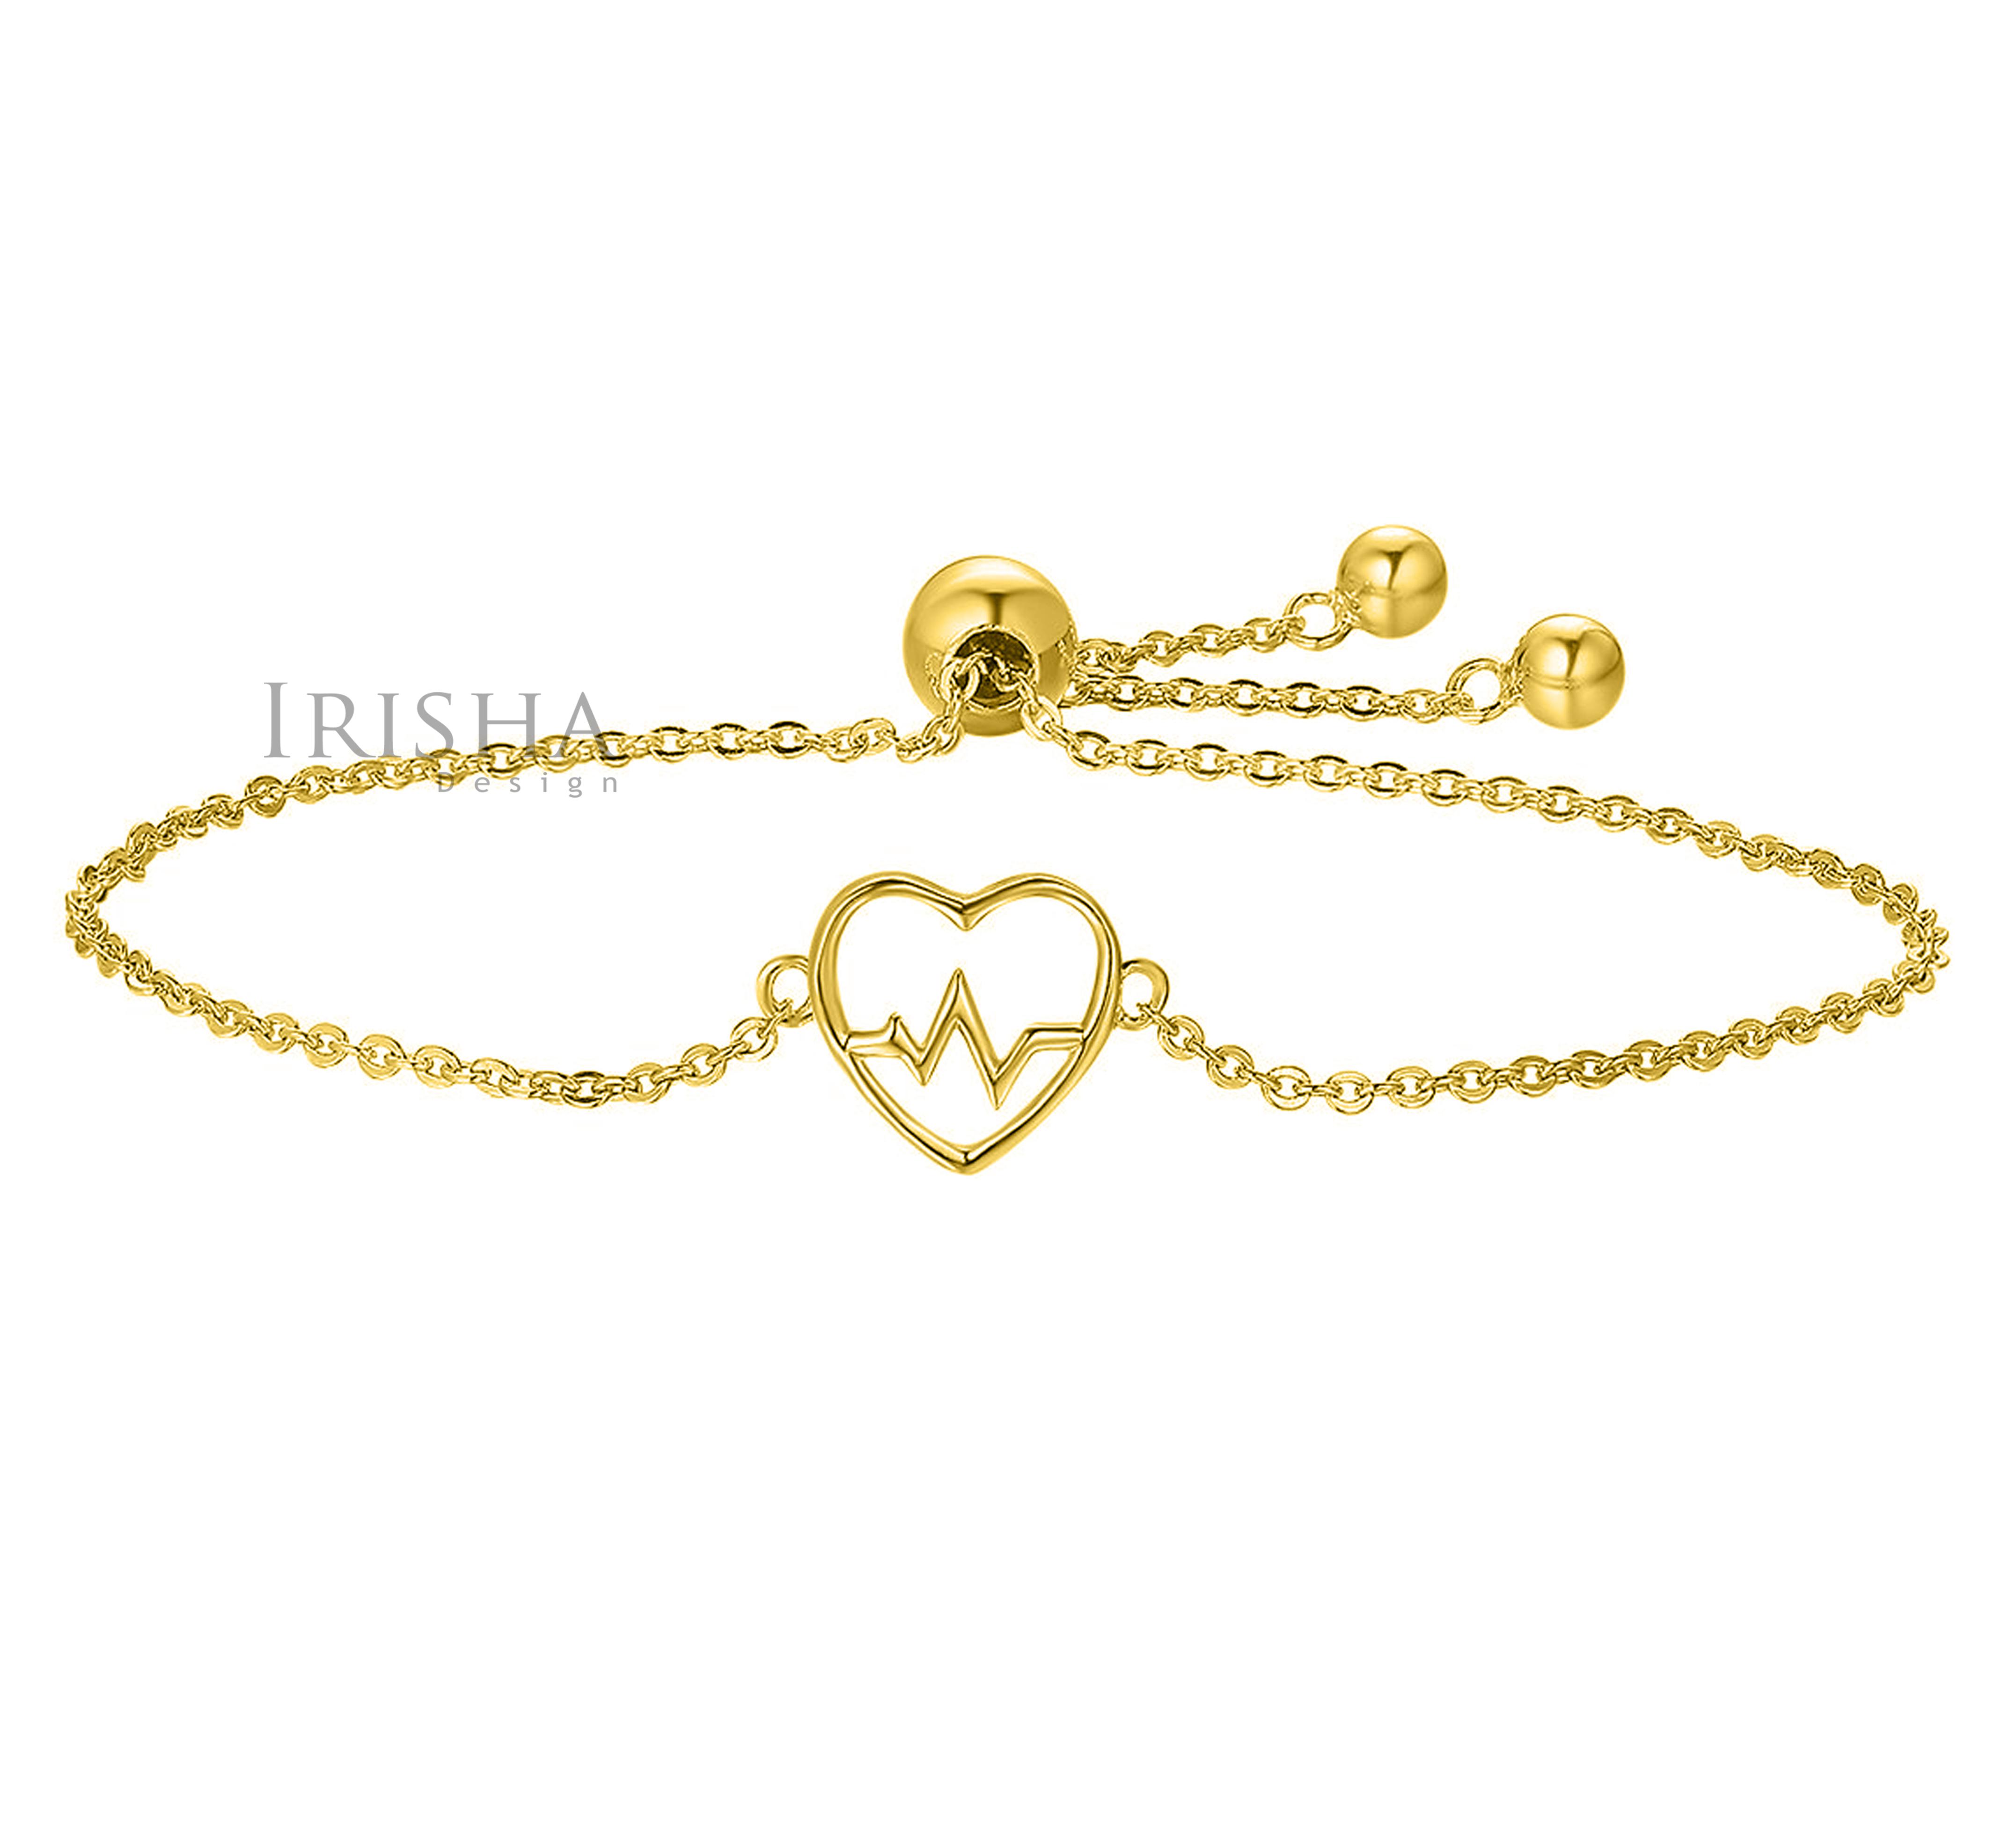 14K Solid Plain Gold Love Heartbeat Chain Bracelet Mother's Day Fine Jewelry